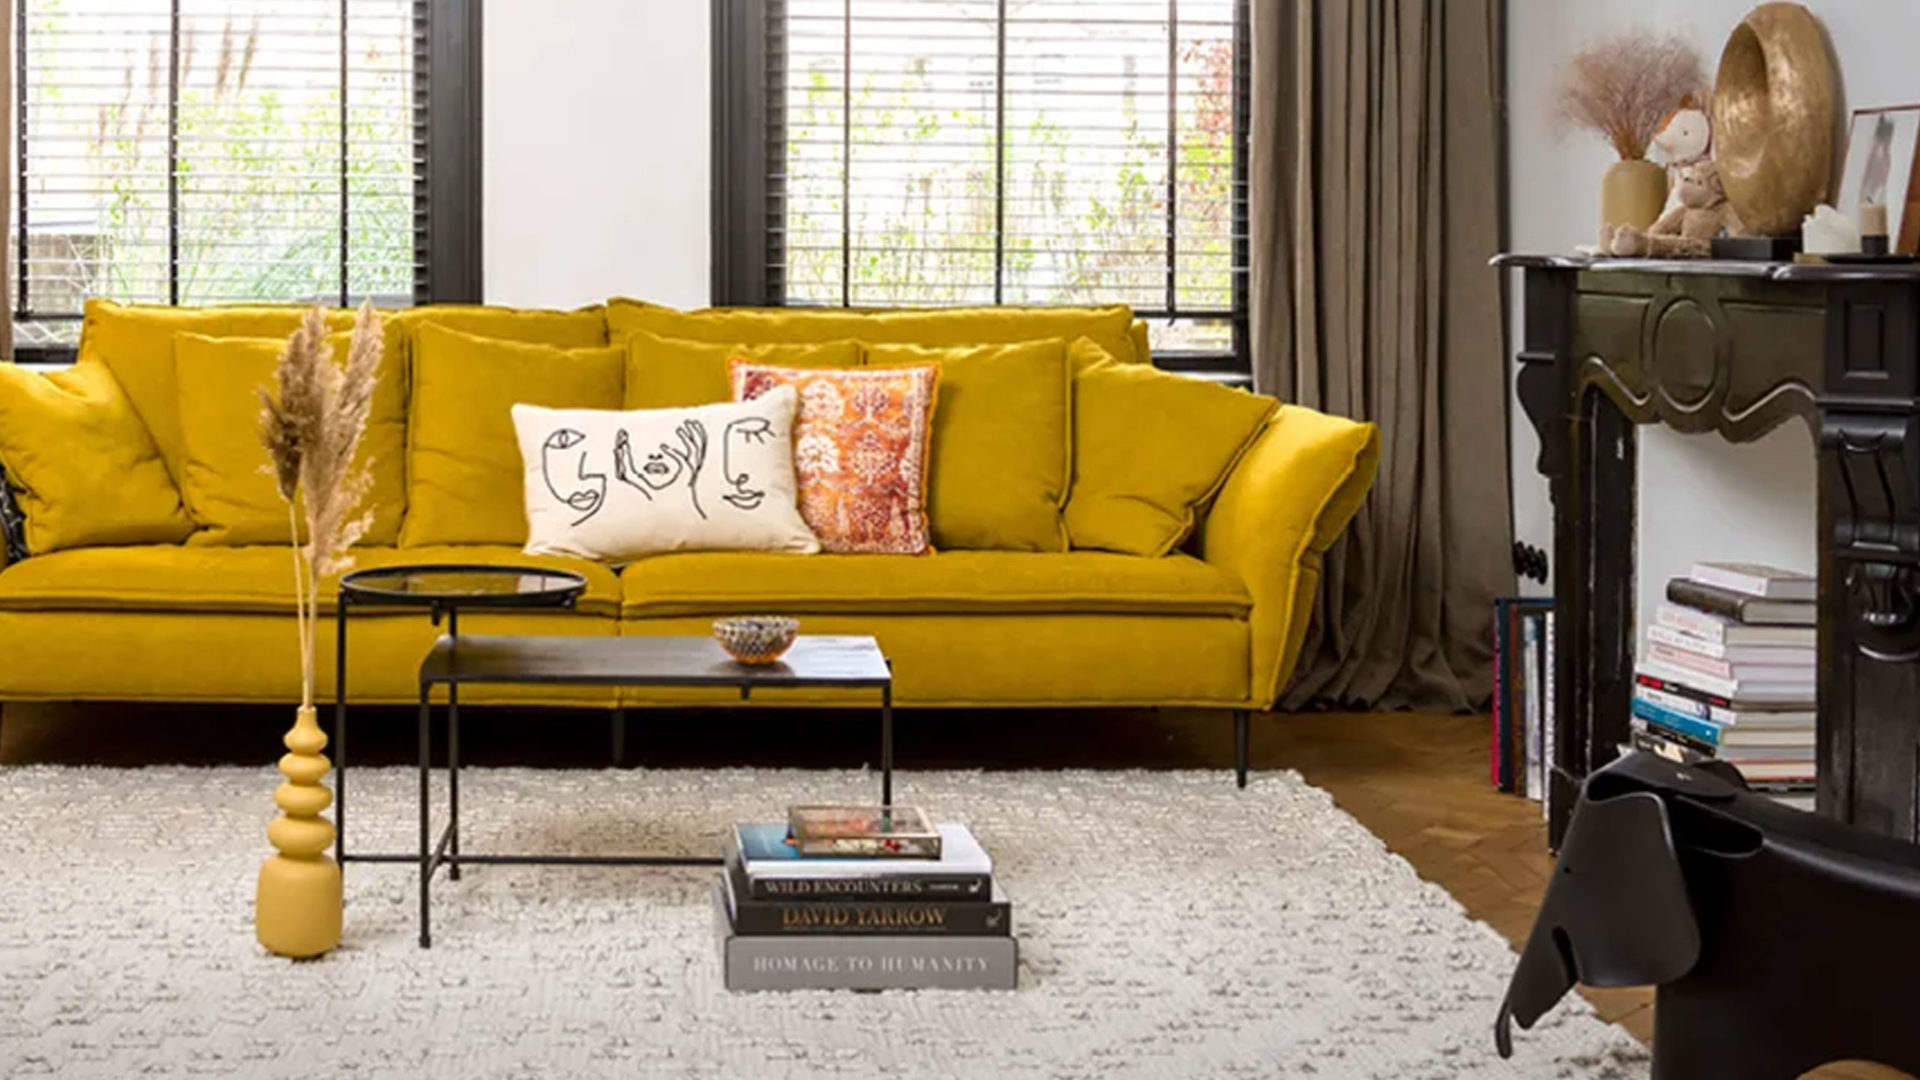 habufa henders & hazel wohnzimmer sofa in gelb